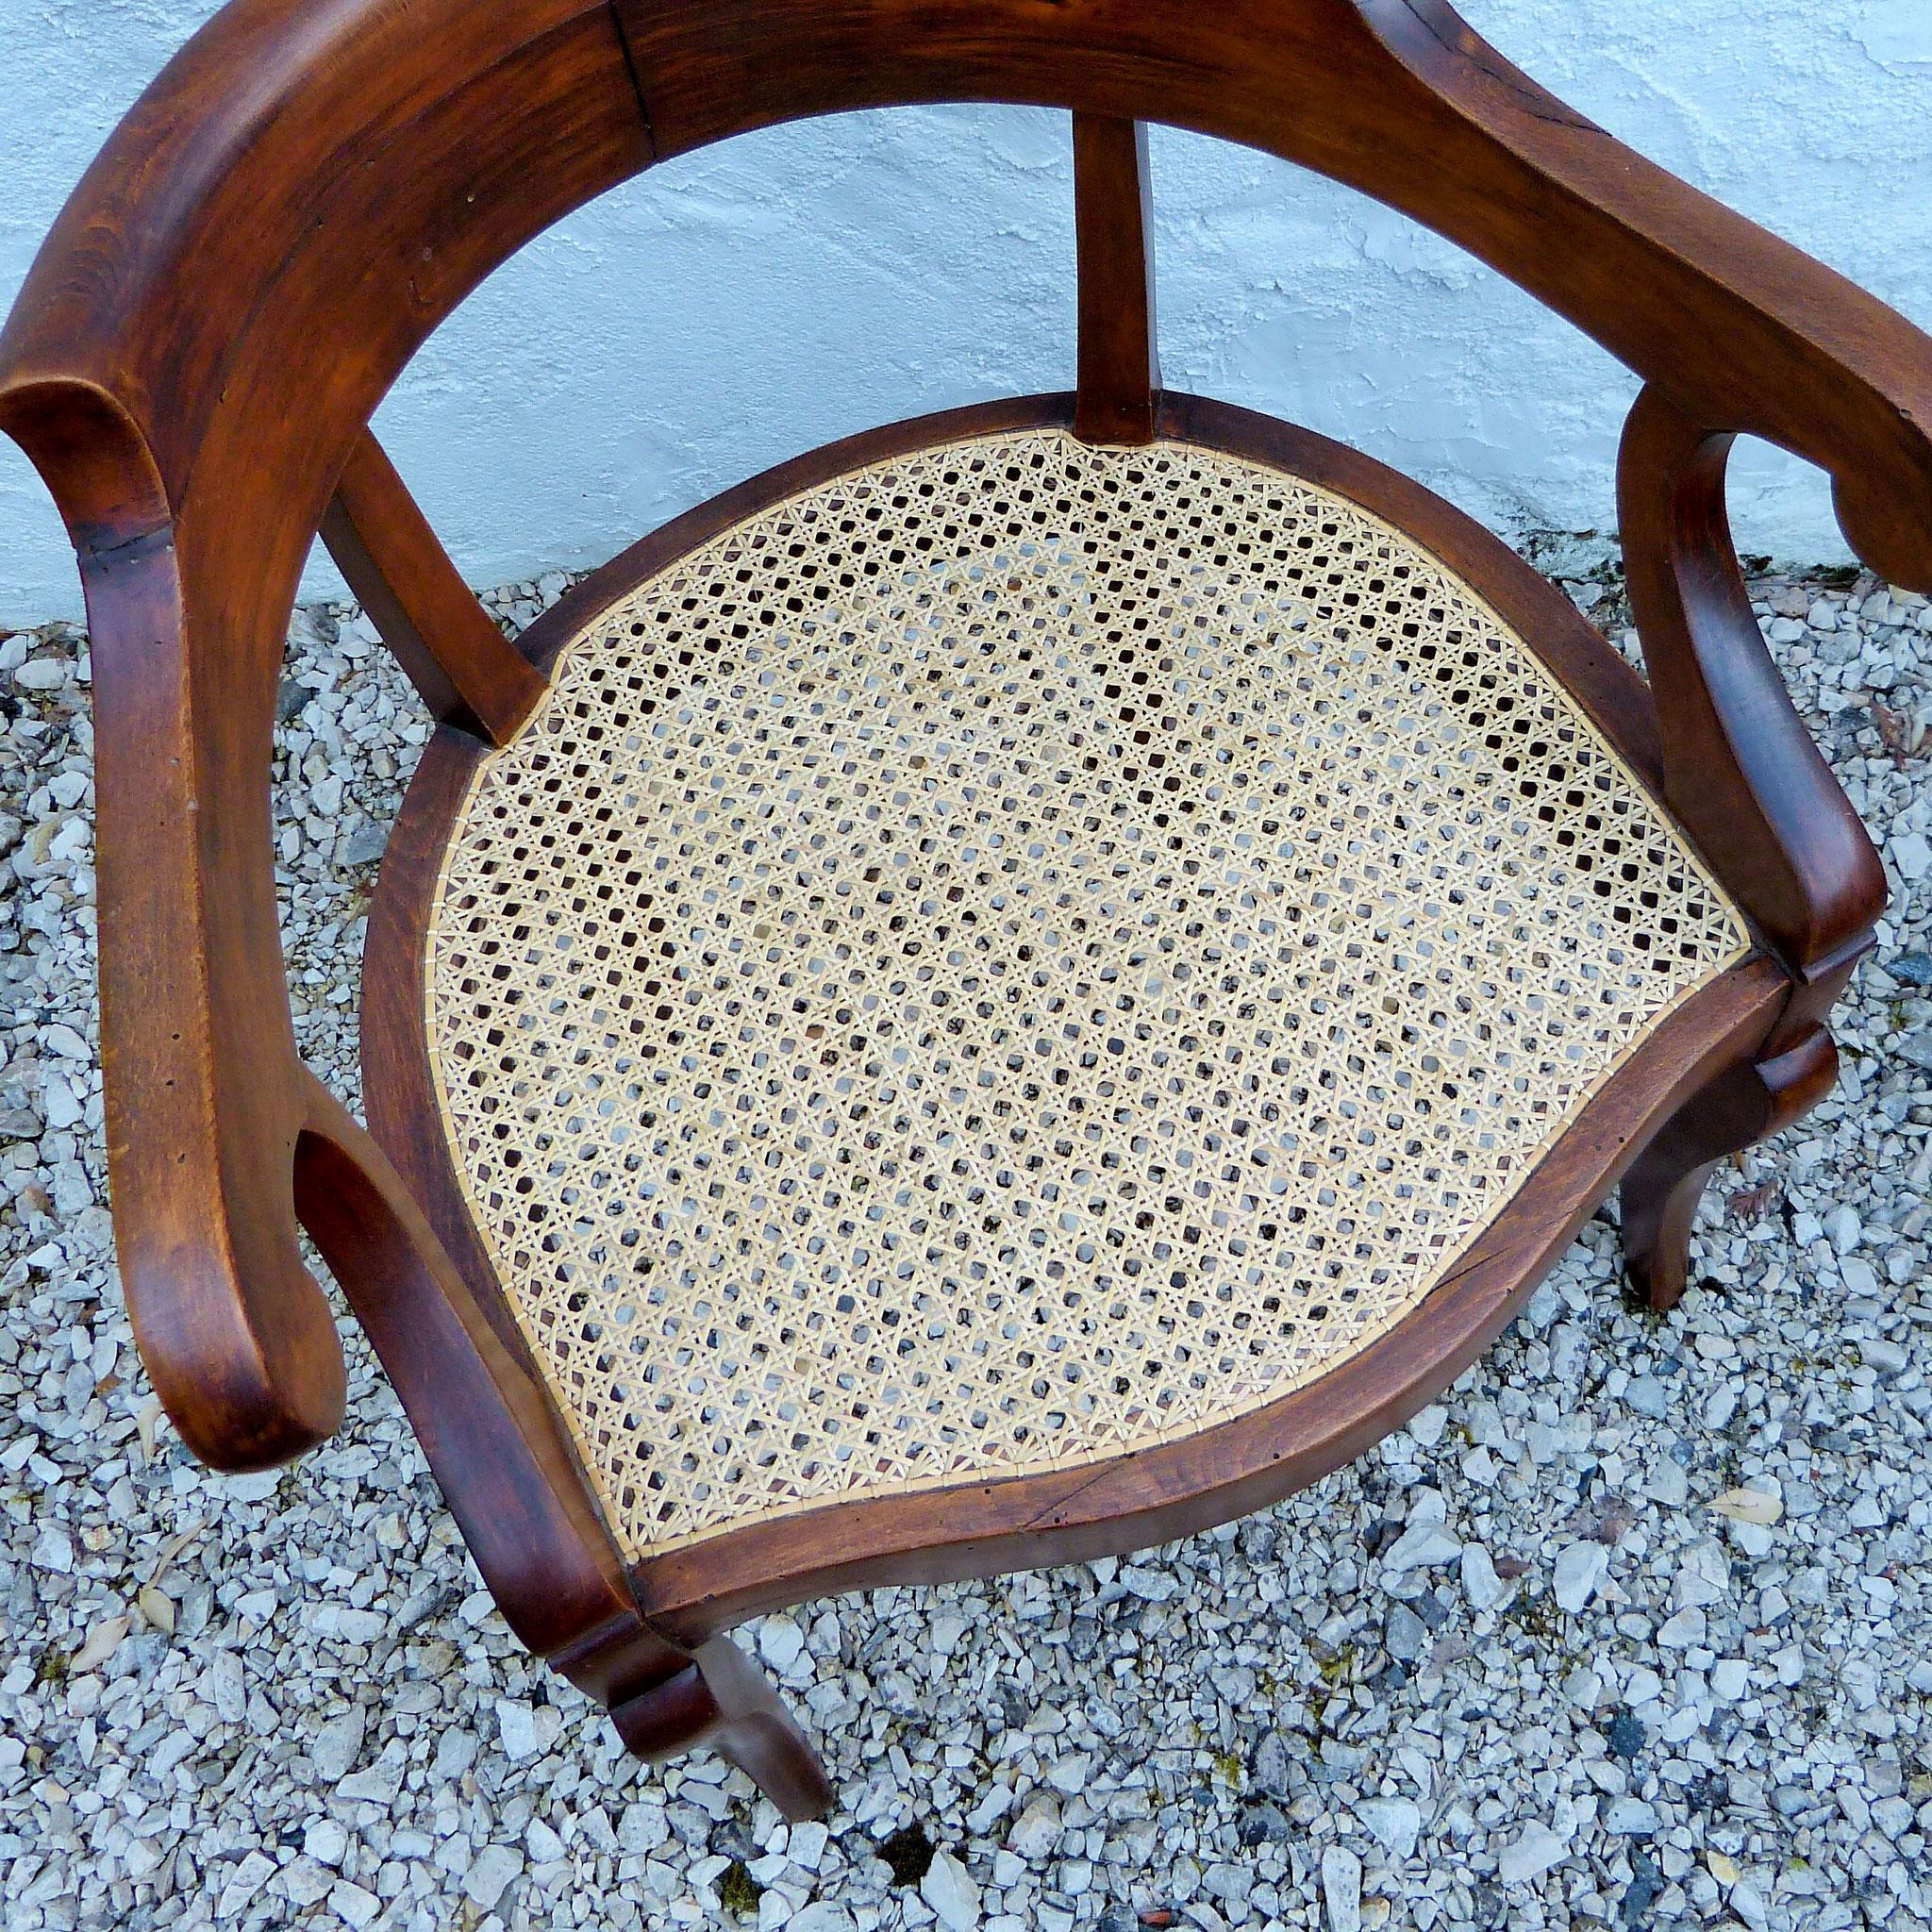 Cannage choisi clair pour contraster avec le bois couleur acajou / Light cane chosen to contrast with the mahogany-coloured wood